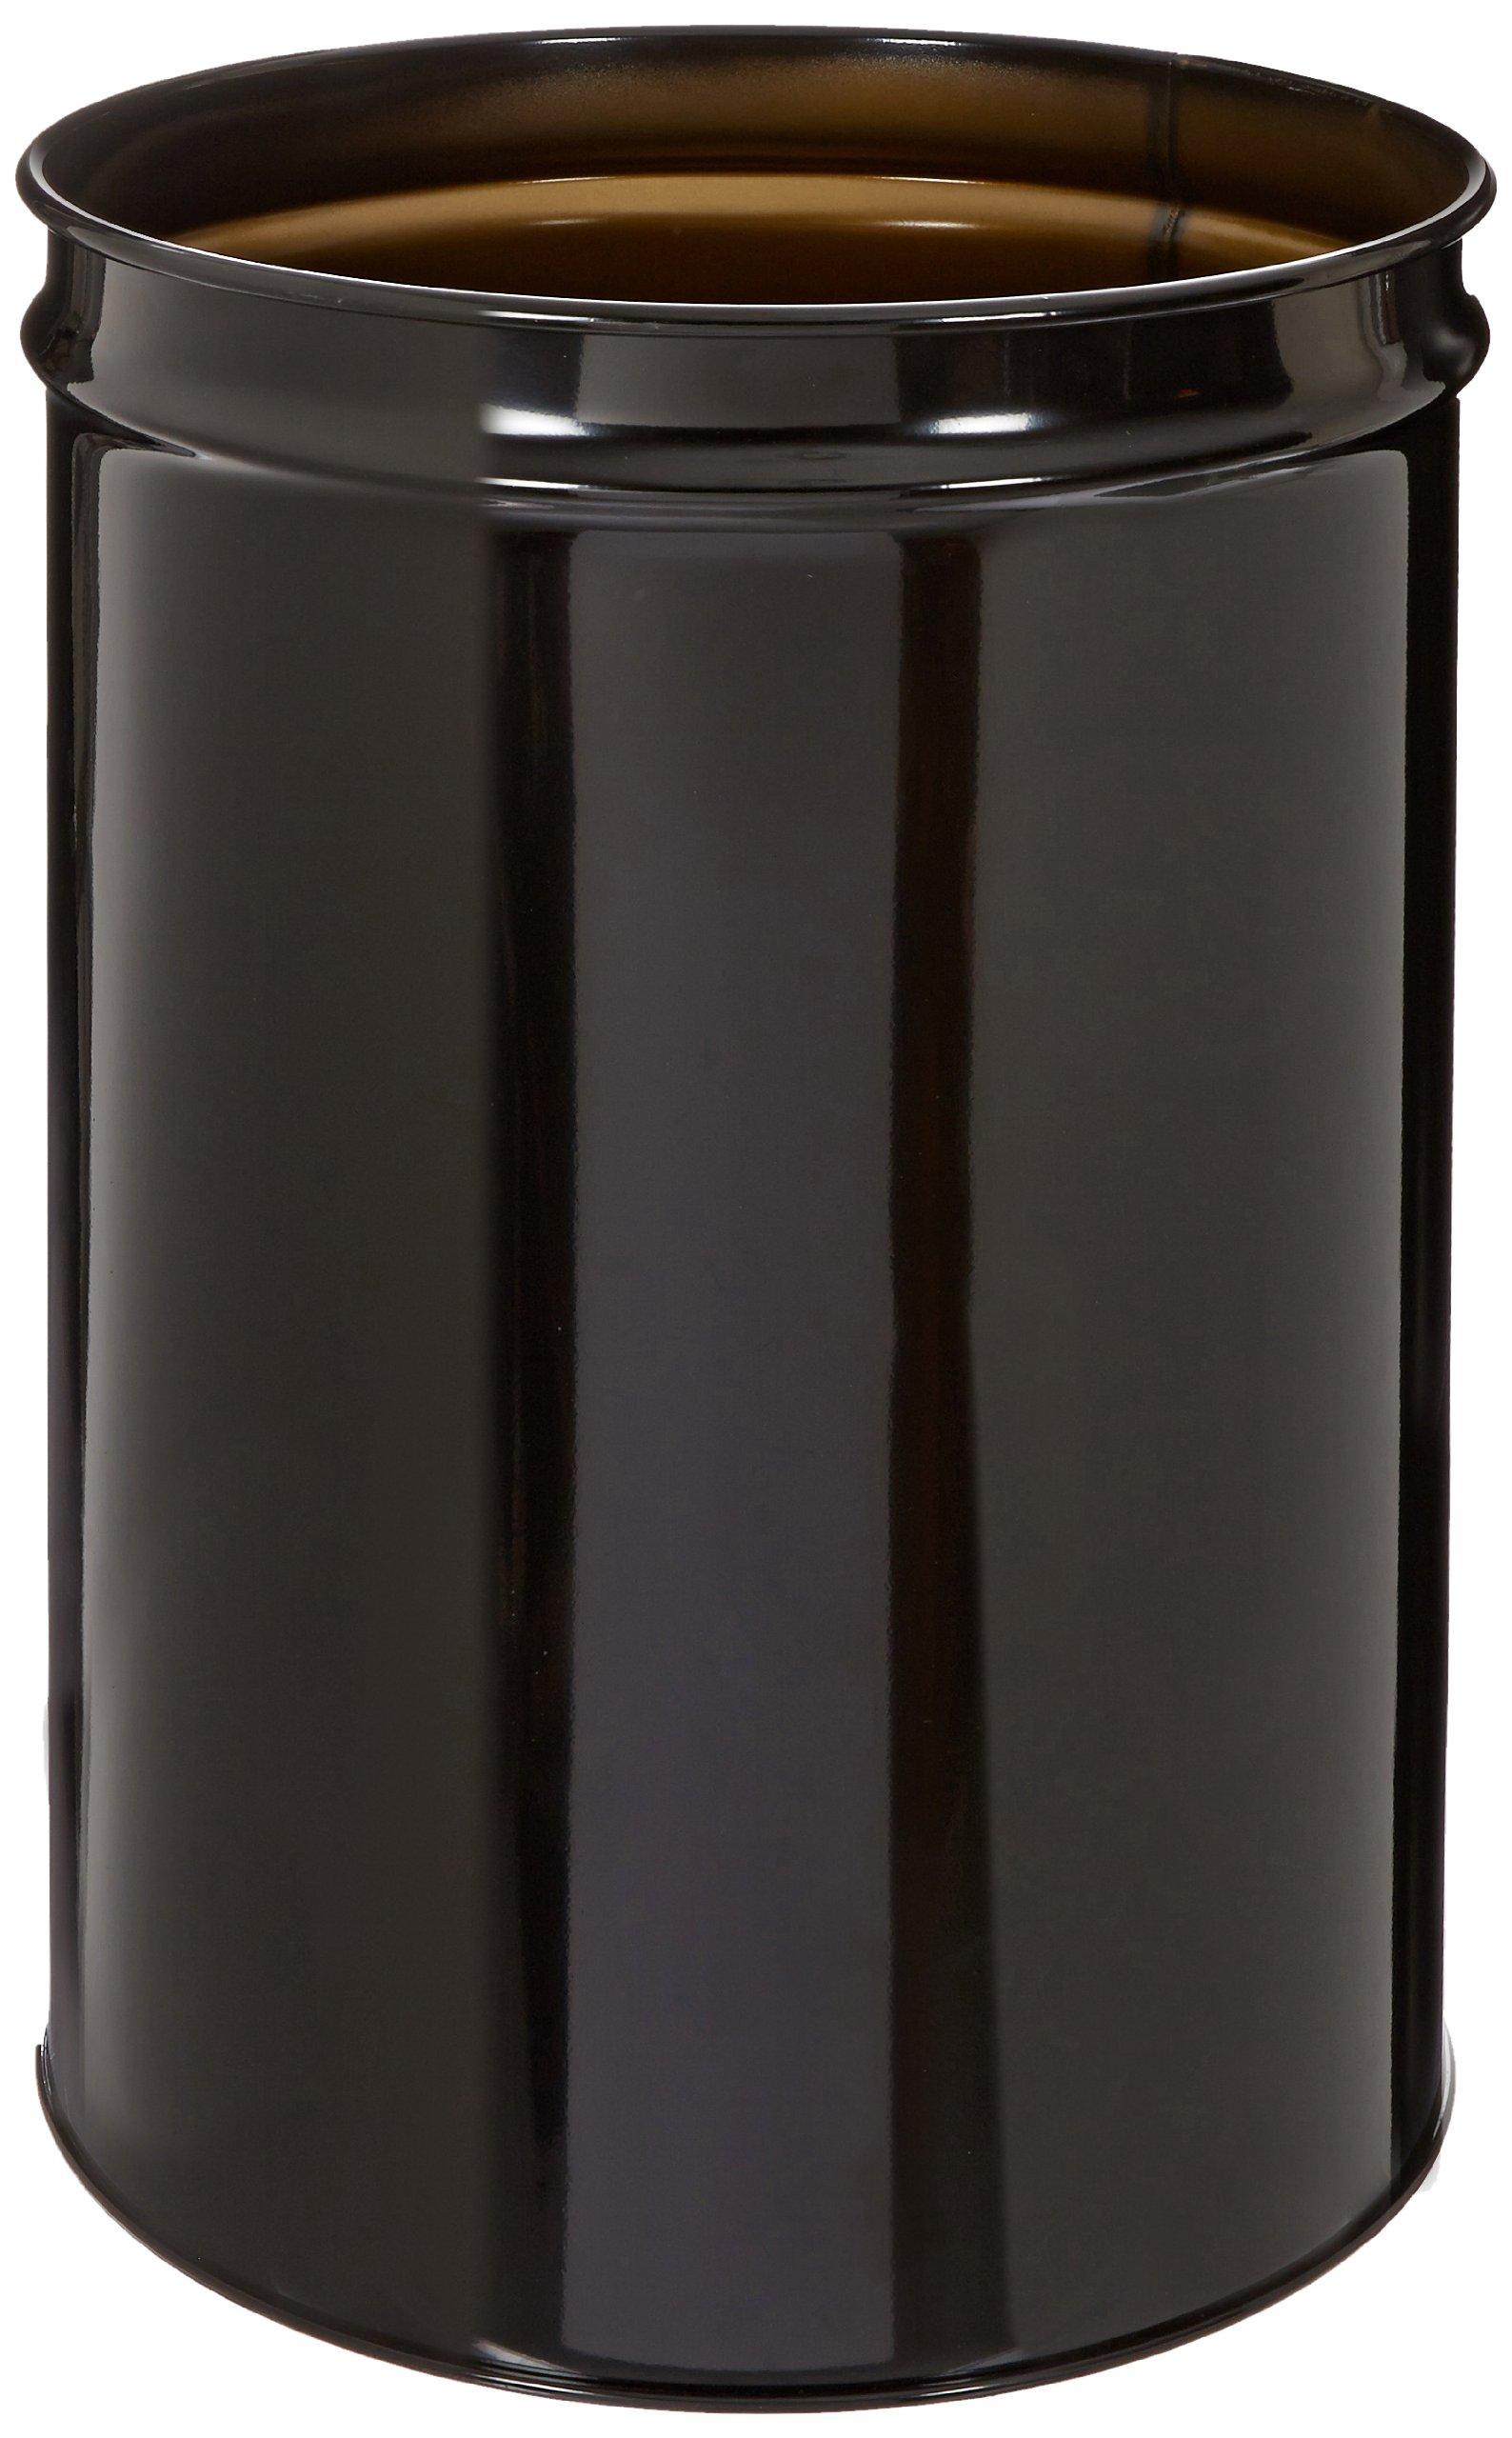 Justrite 26054K Cease-Fire Steel Drum, 55 Gallon Capacity, 23-3/4'' OD x 34-1/2'' Height, Black